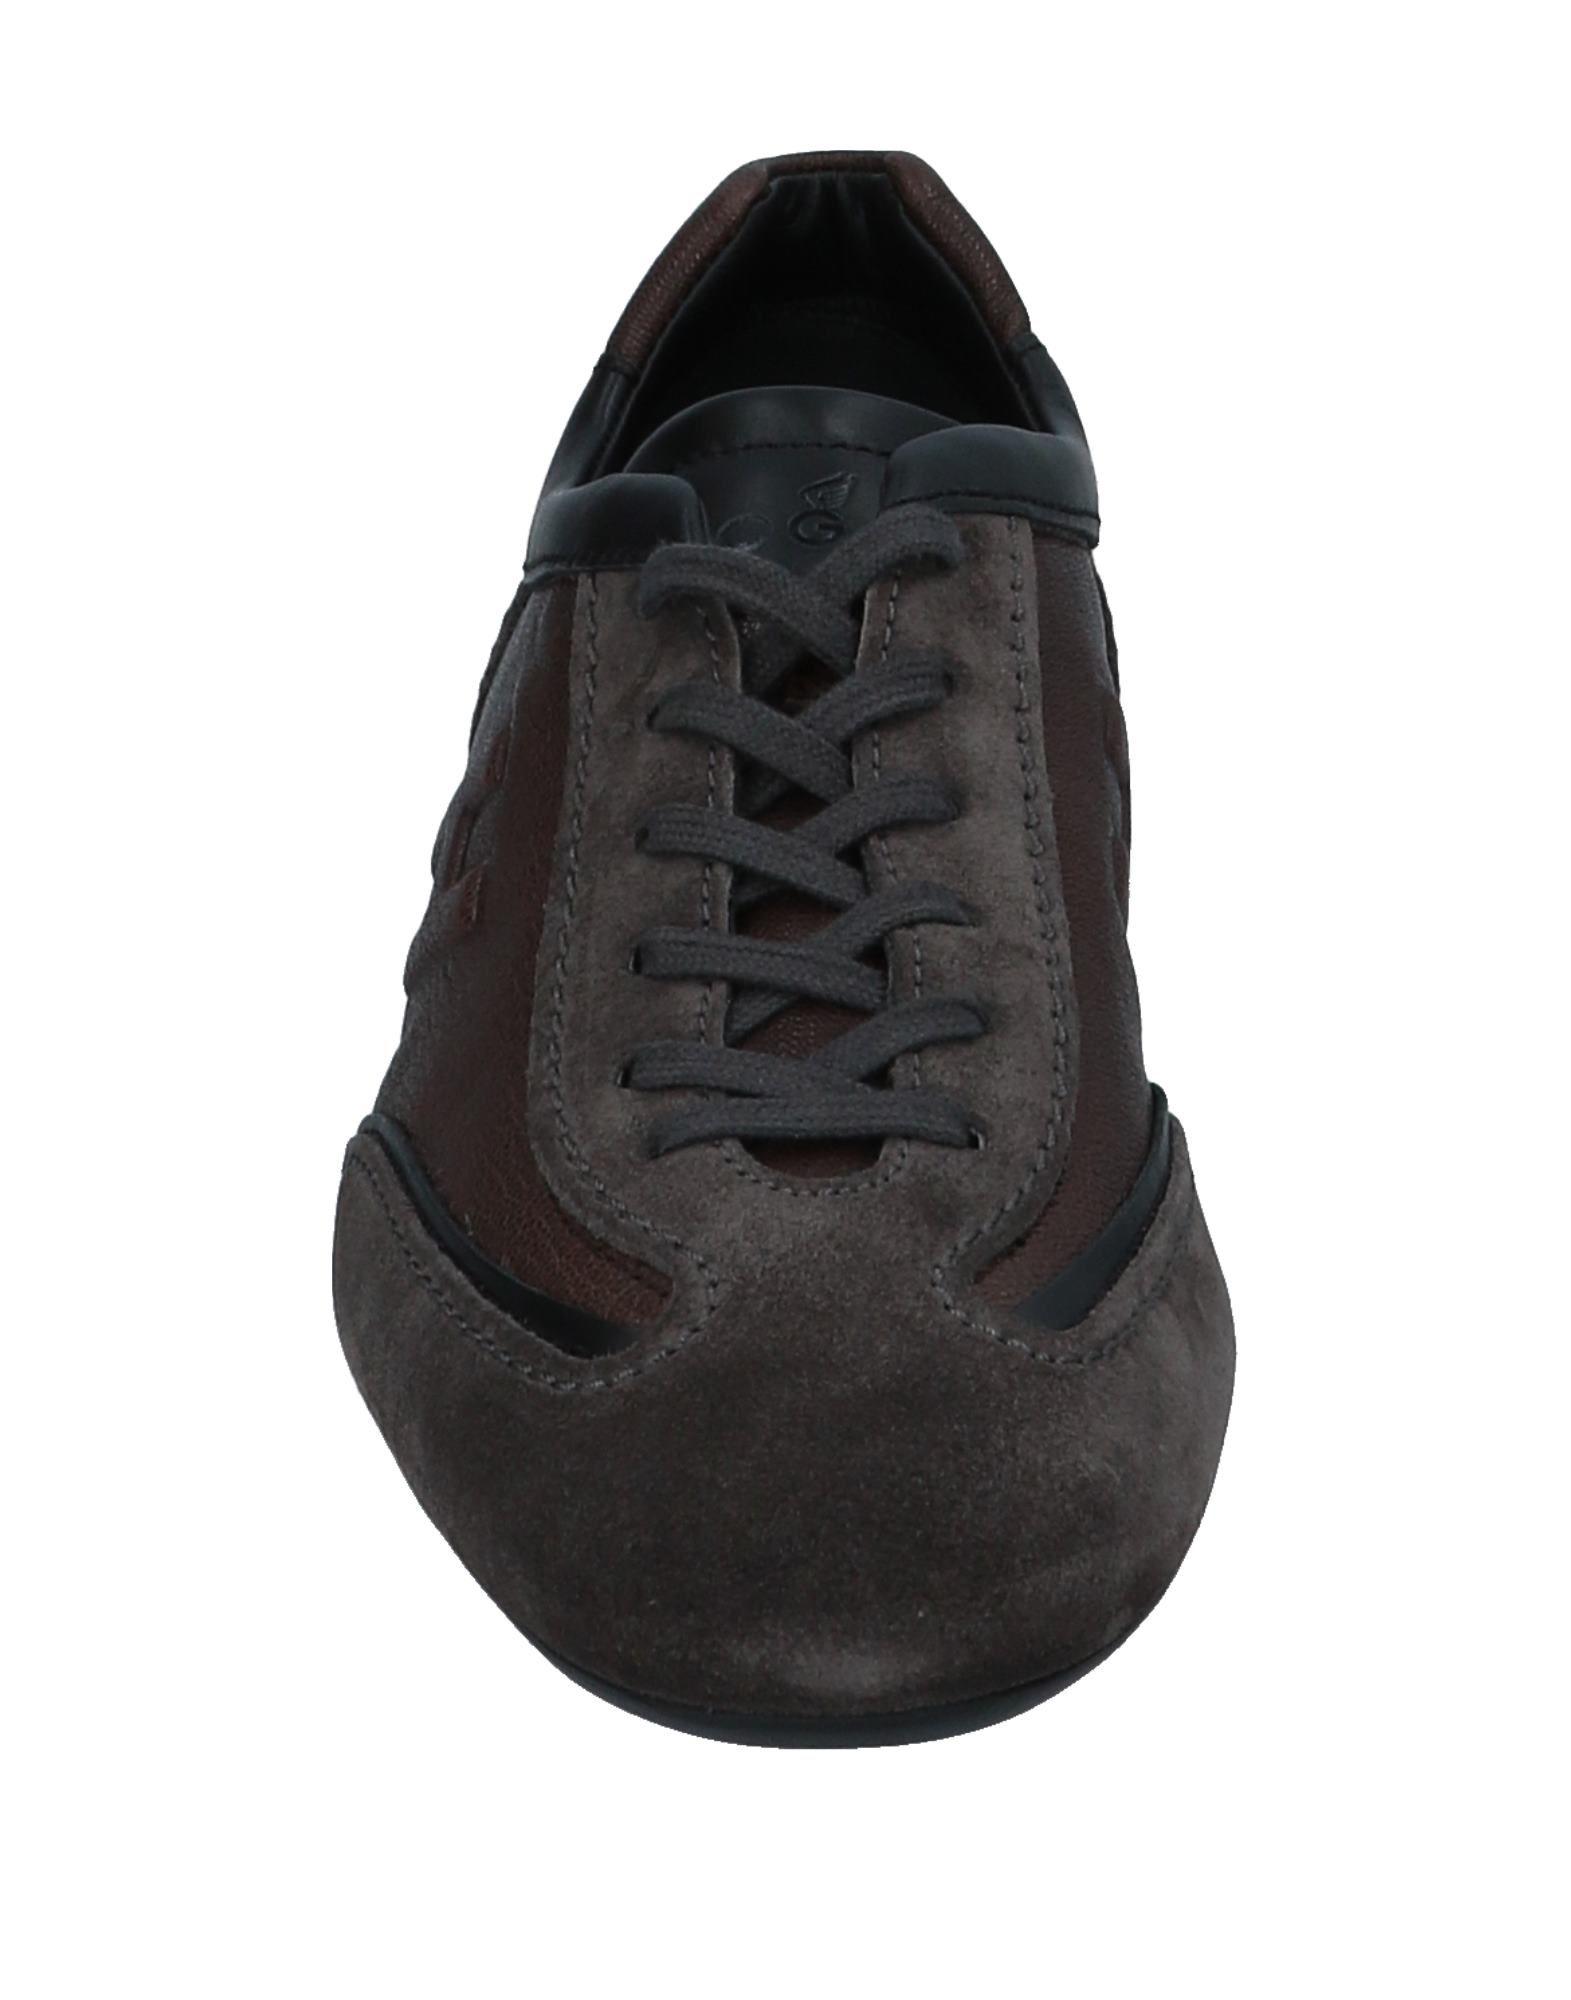 11542750WV Hogan Sneakers Herren  11542750WV  3750e6